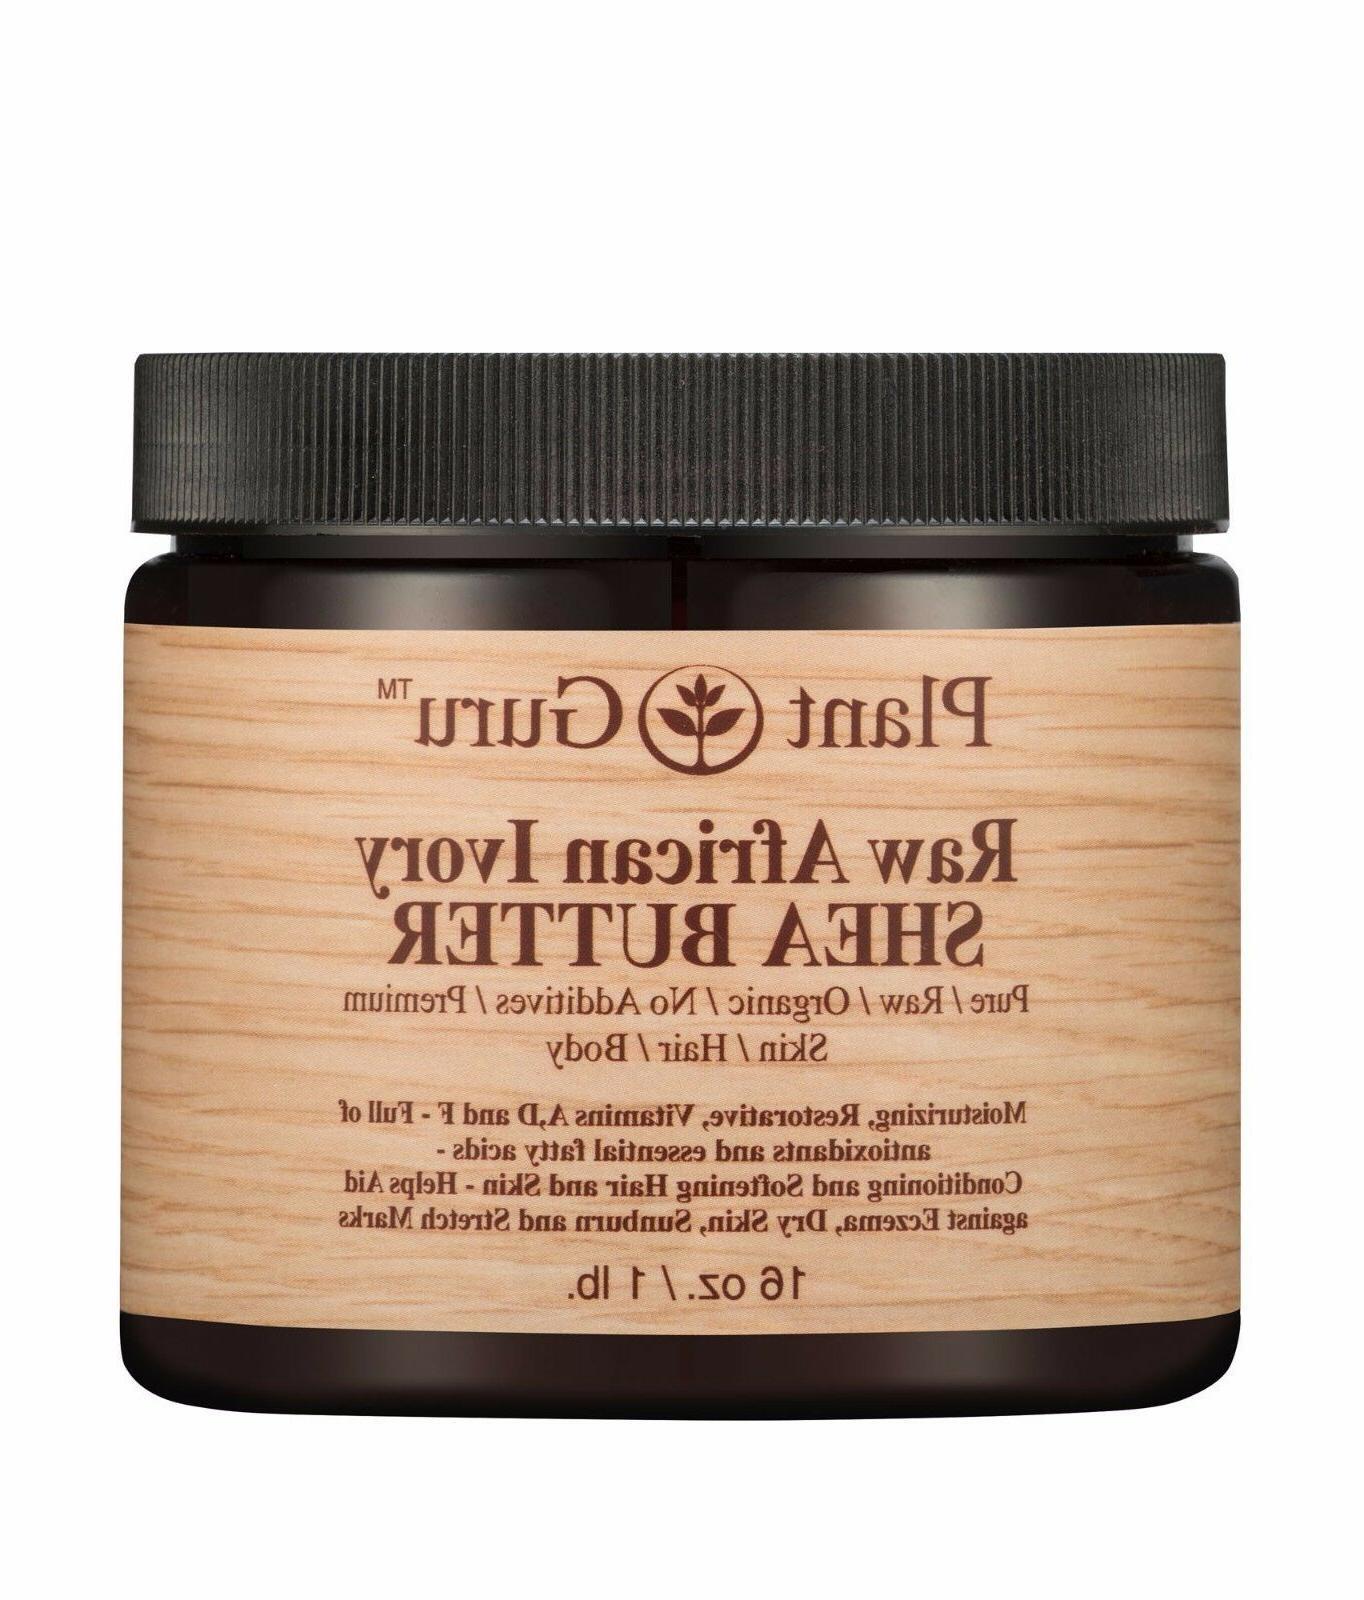 Premium Cold Pressed Skin Hair